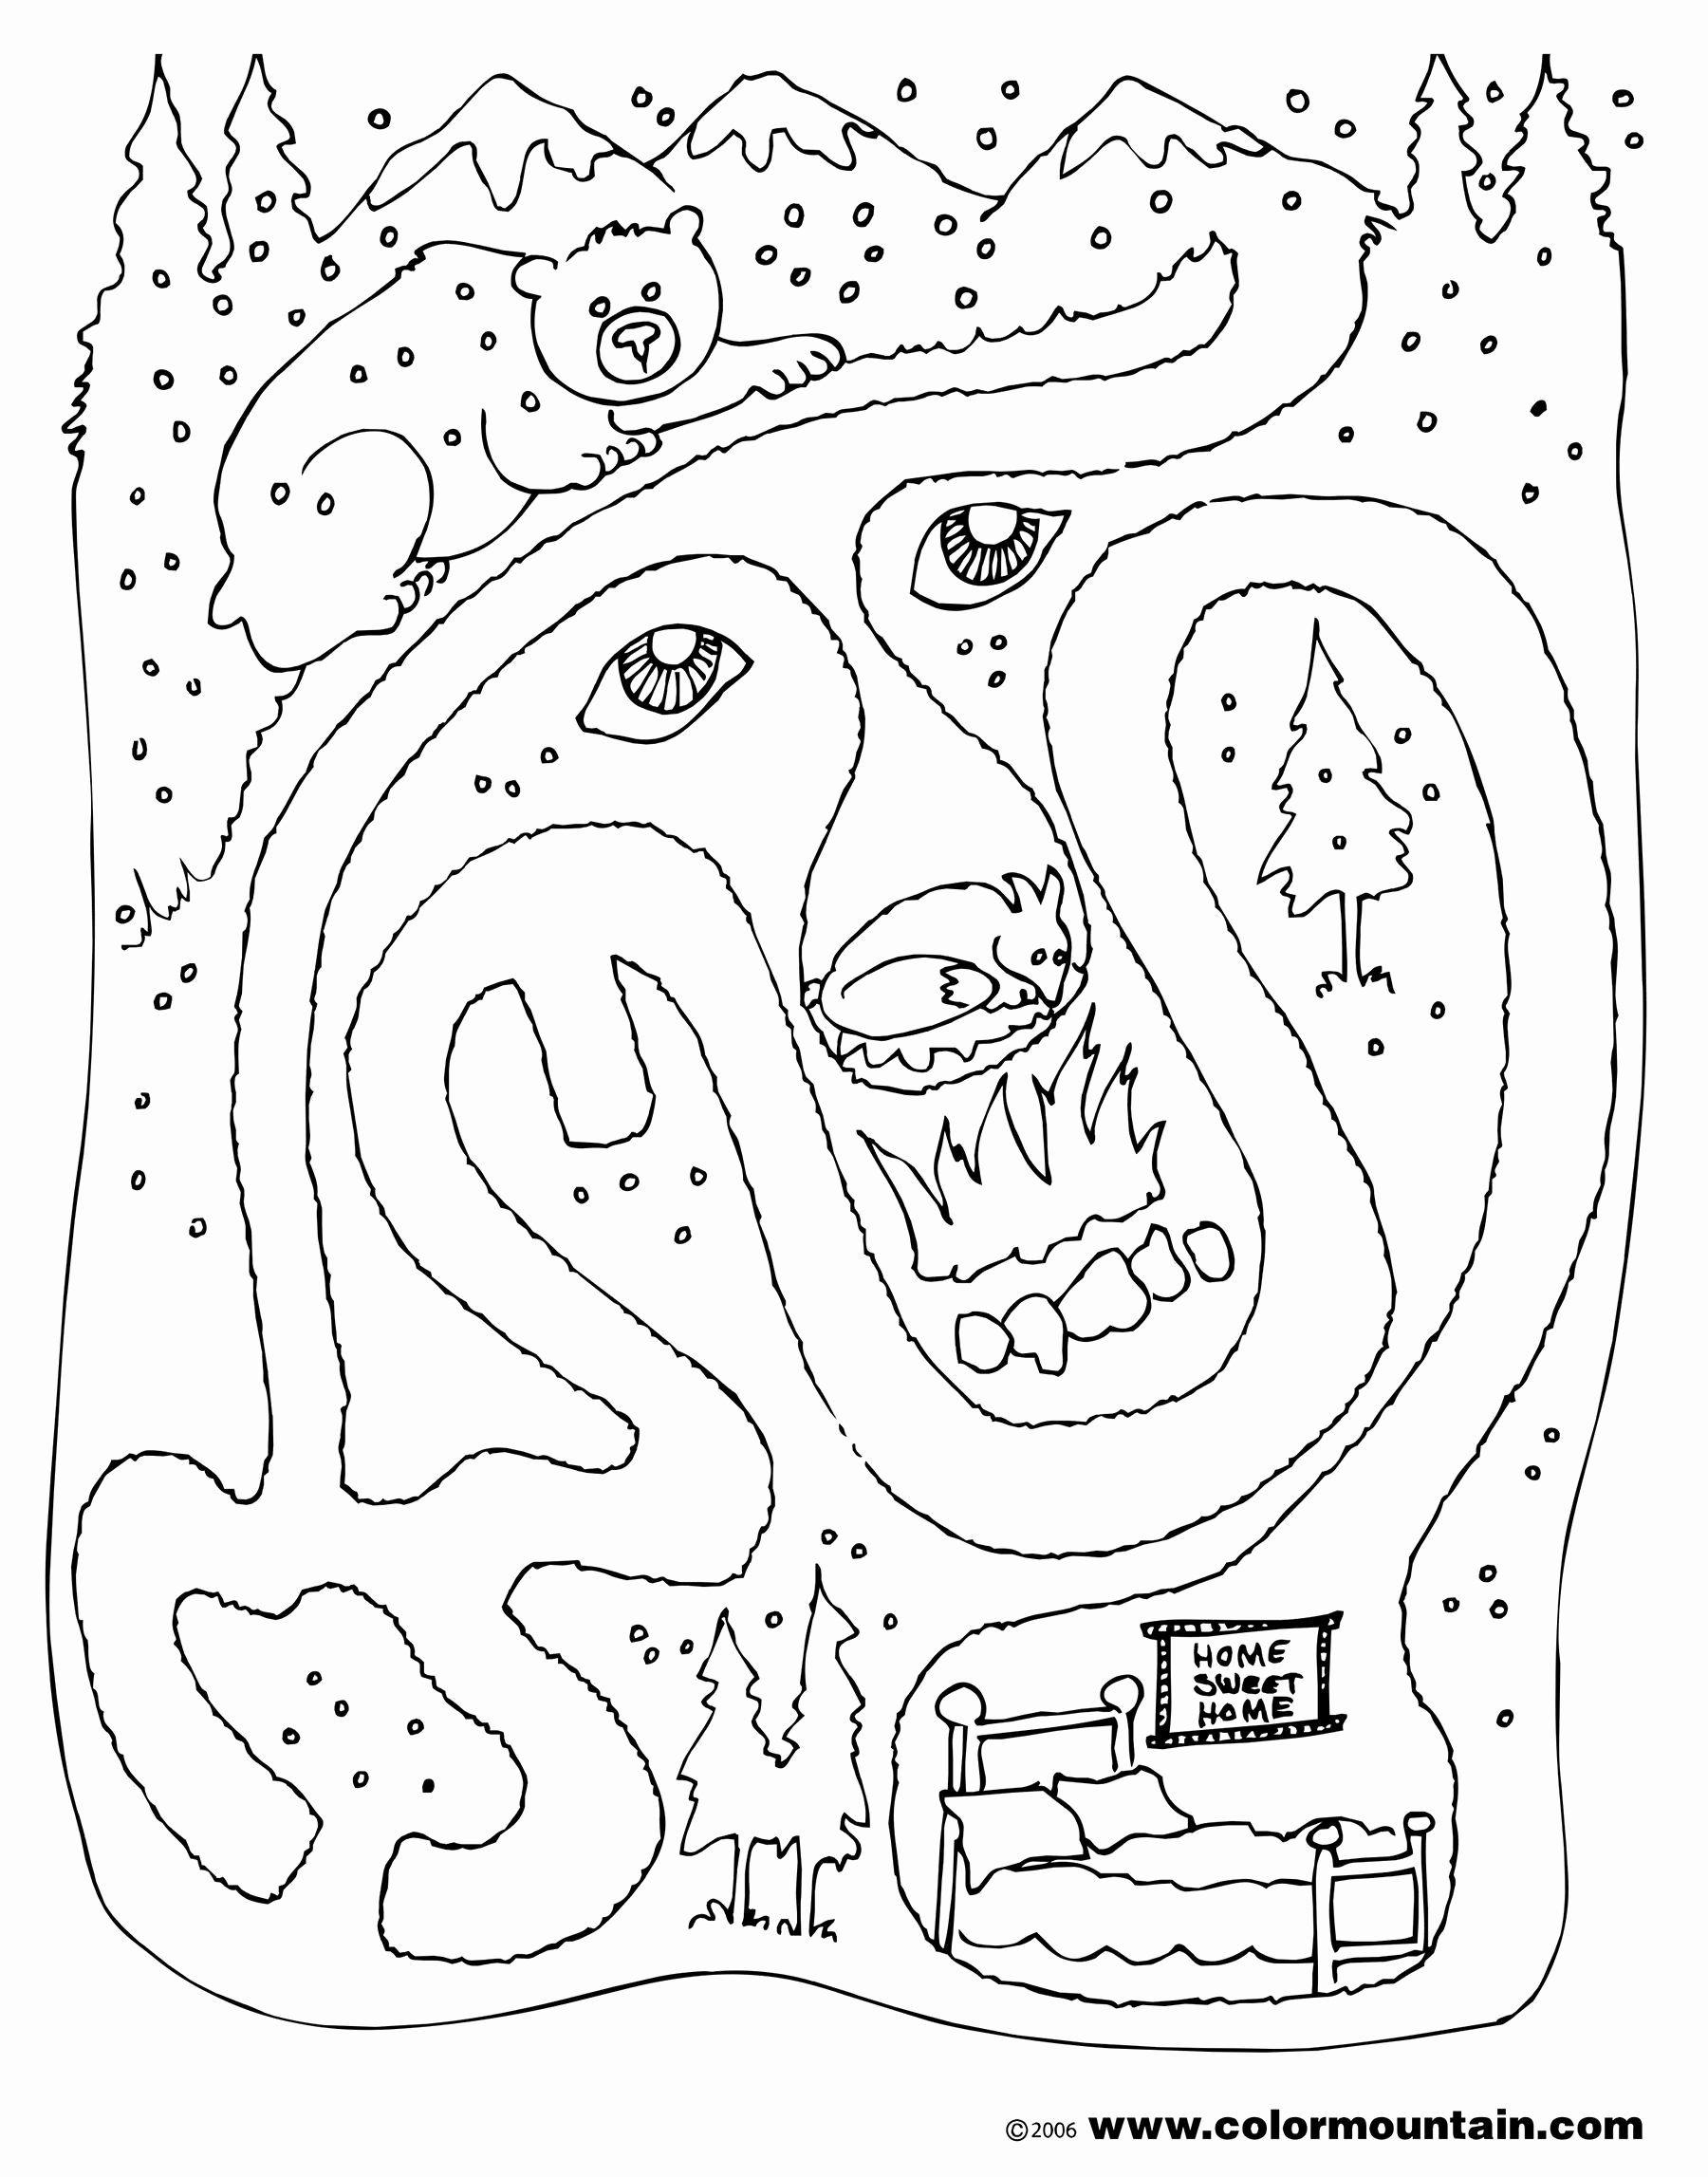 Hibernating Animals Coloring Pages Best Of Bear Maze Activity Color Page Coloring Page Animals That Hibernate Kindergarten Worksheets Animal Coloring Pages